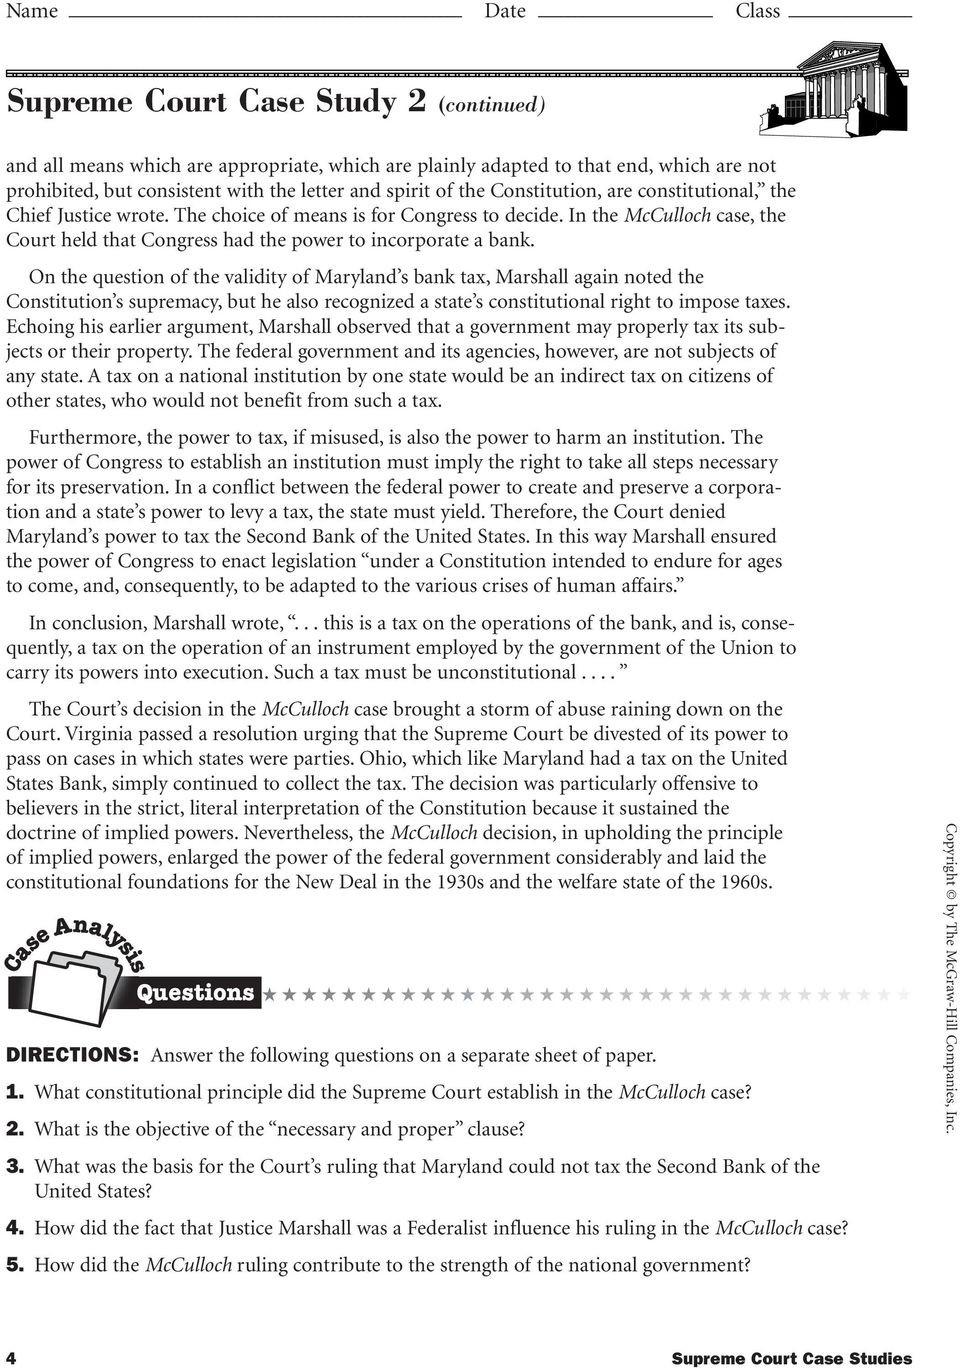 Supreme Court Case Stu s PDF Free Download